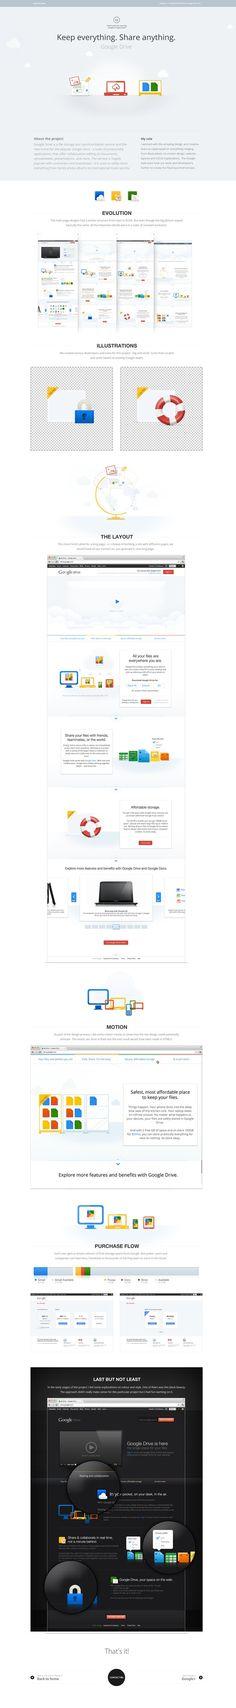 Google Drive - Case Study  by Haraldur Thorleifsson